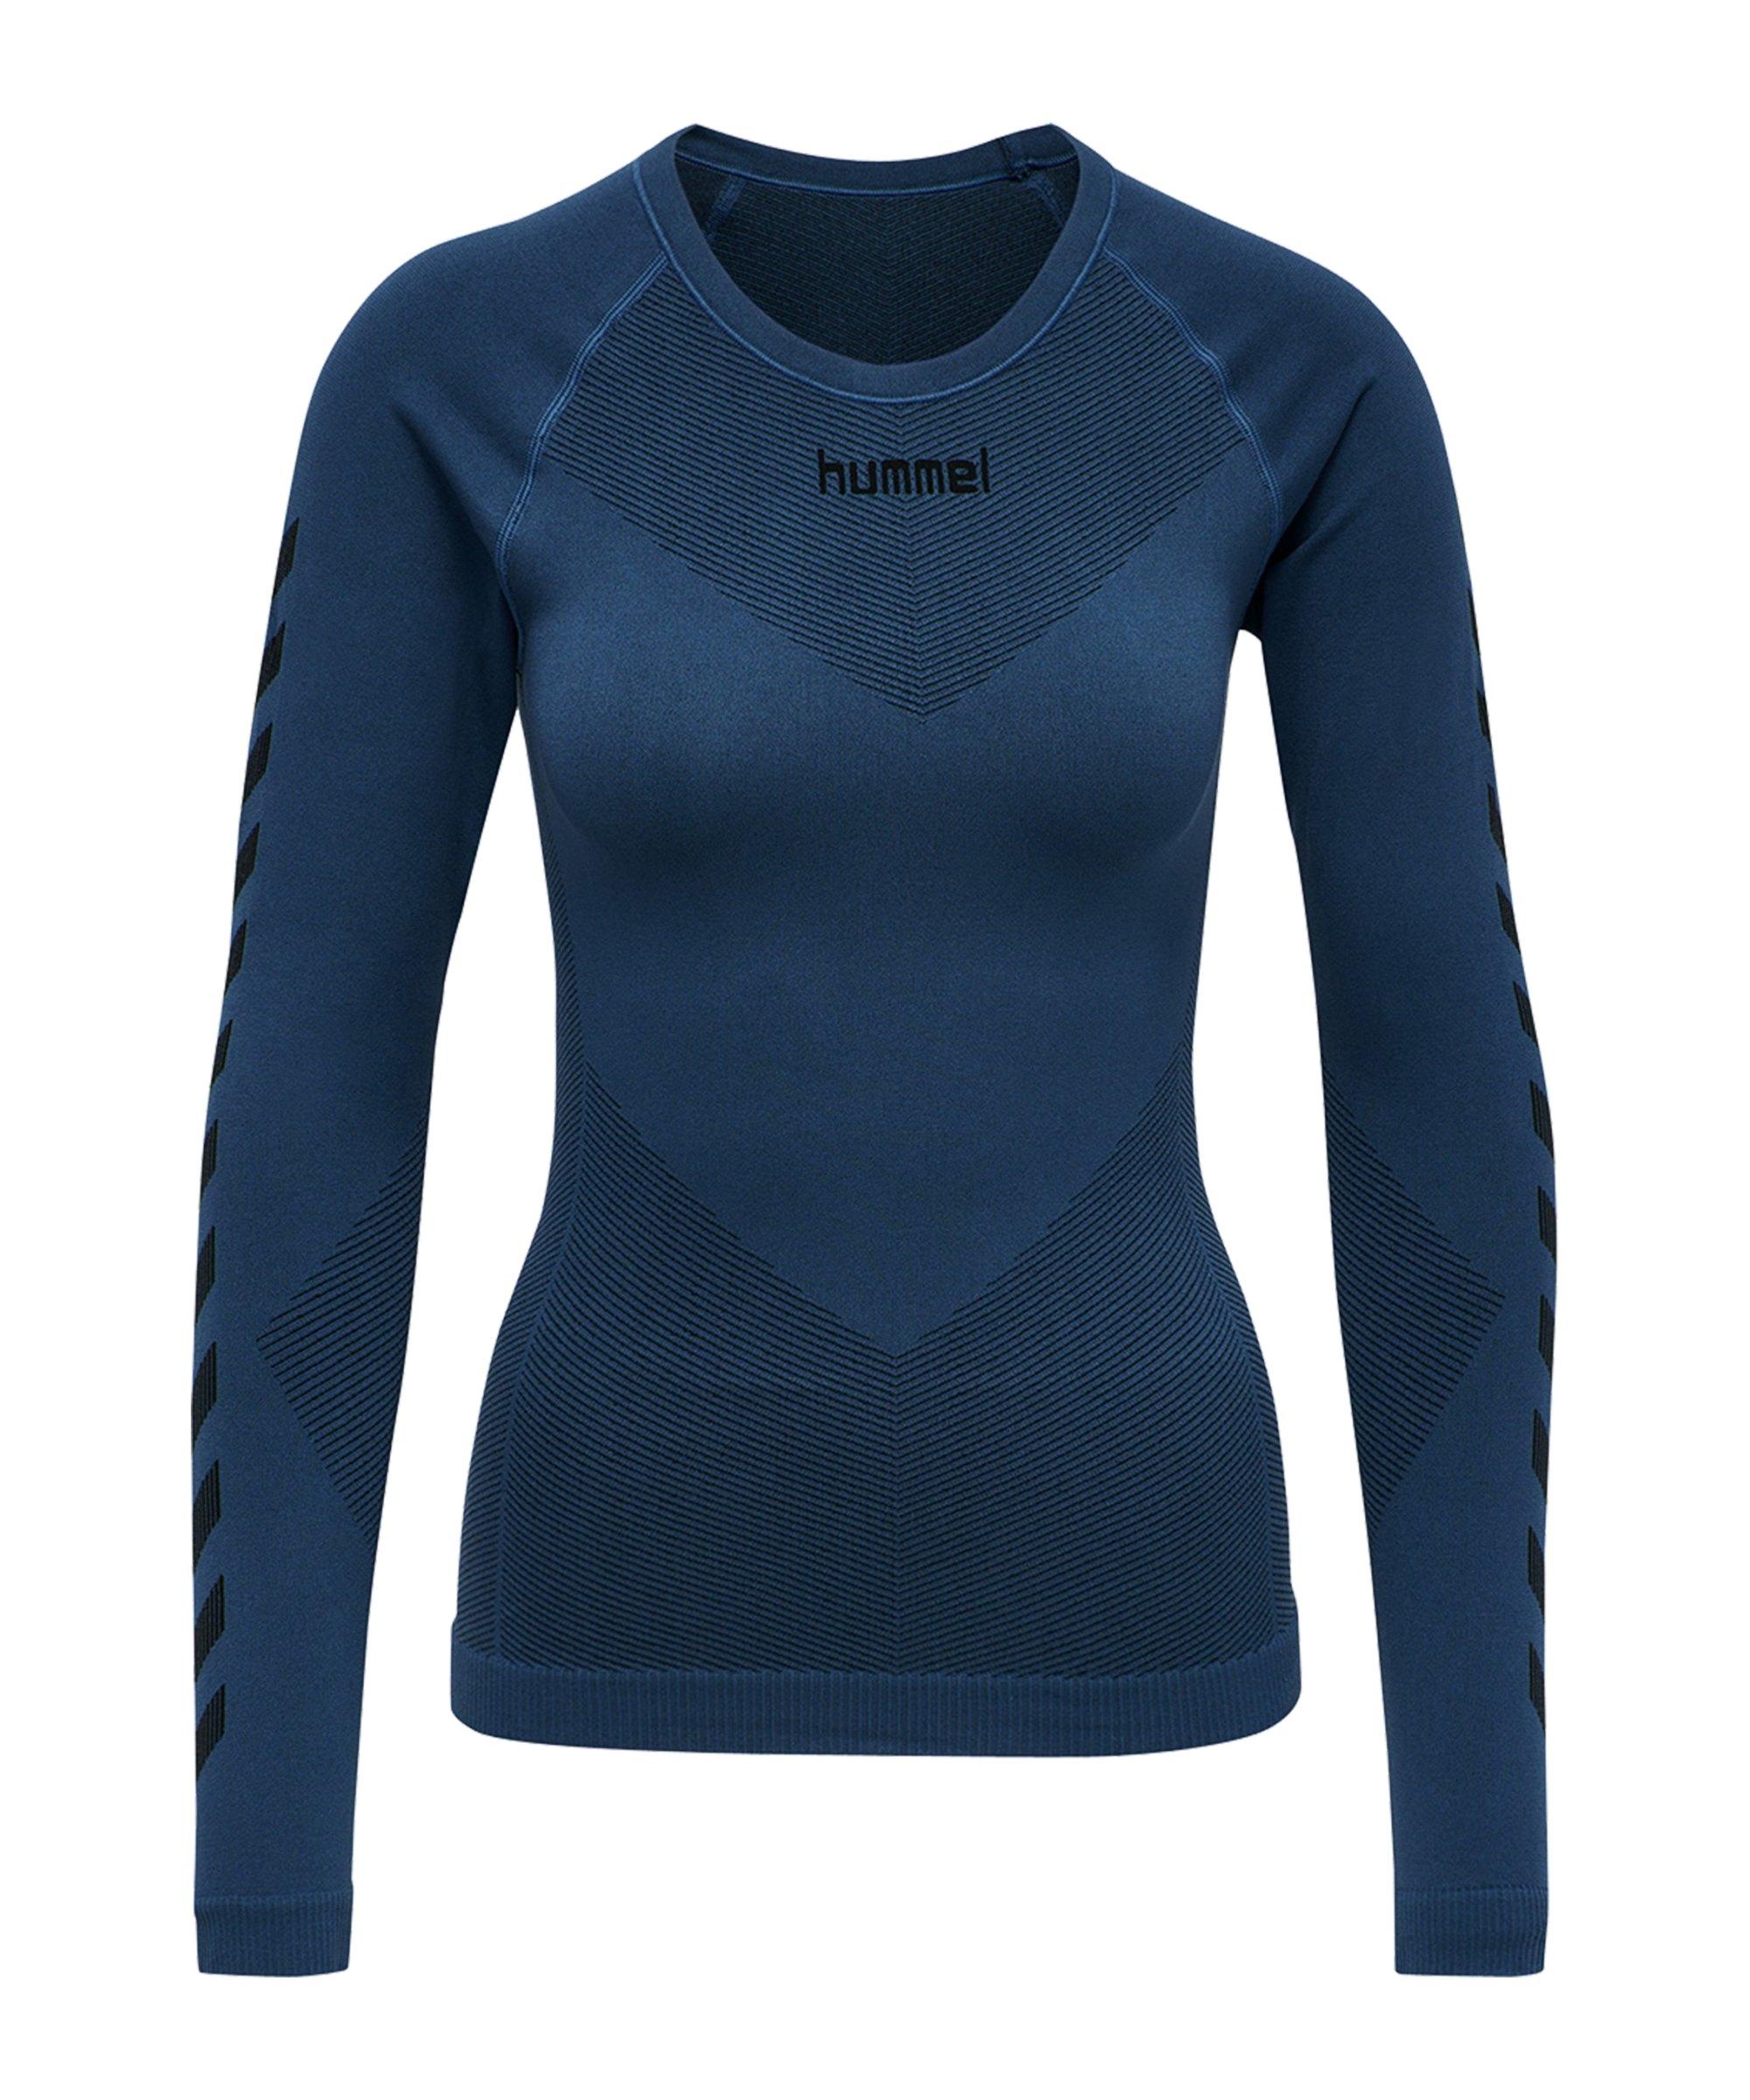 Hummel First Seamless Longsleeve Damen Blau F7642 - blau